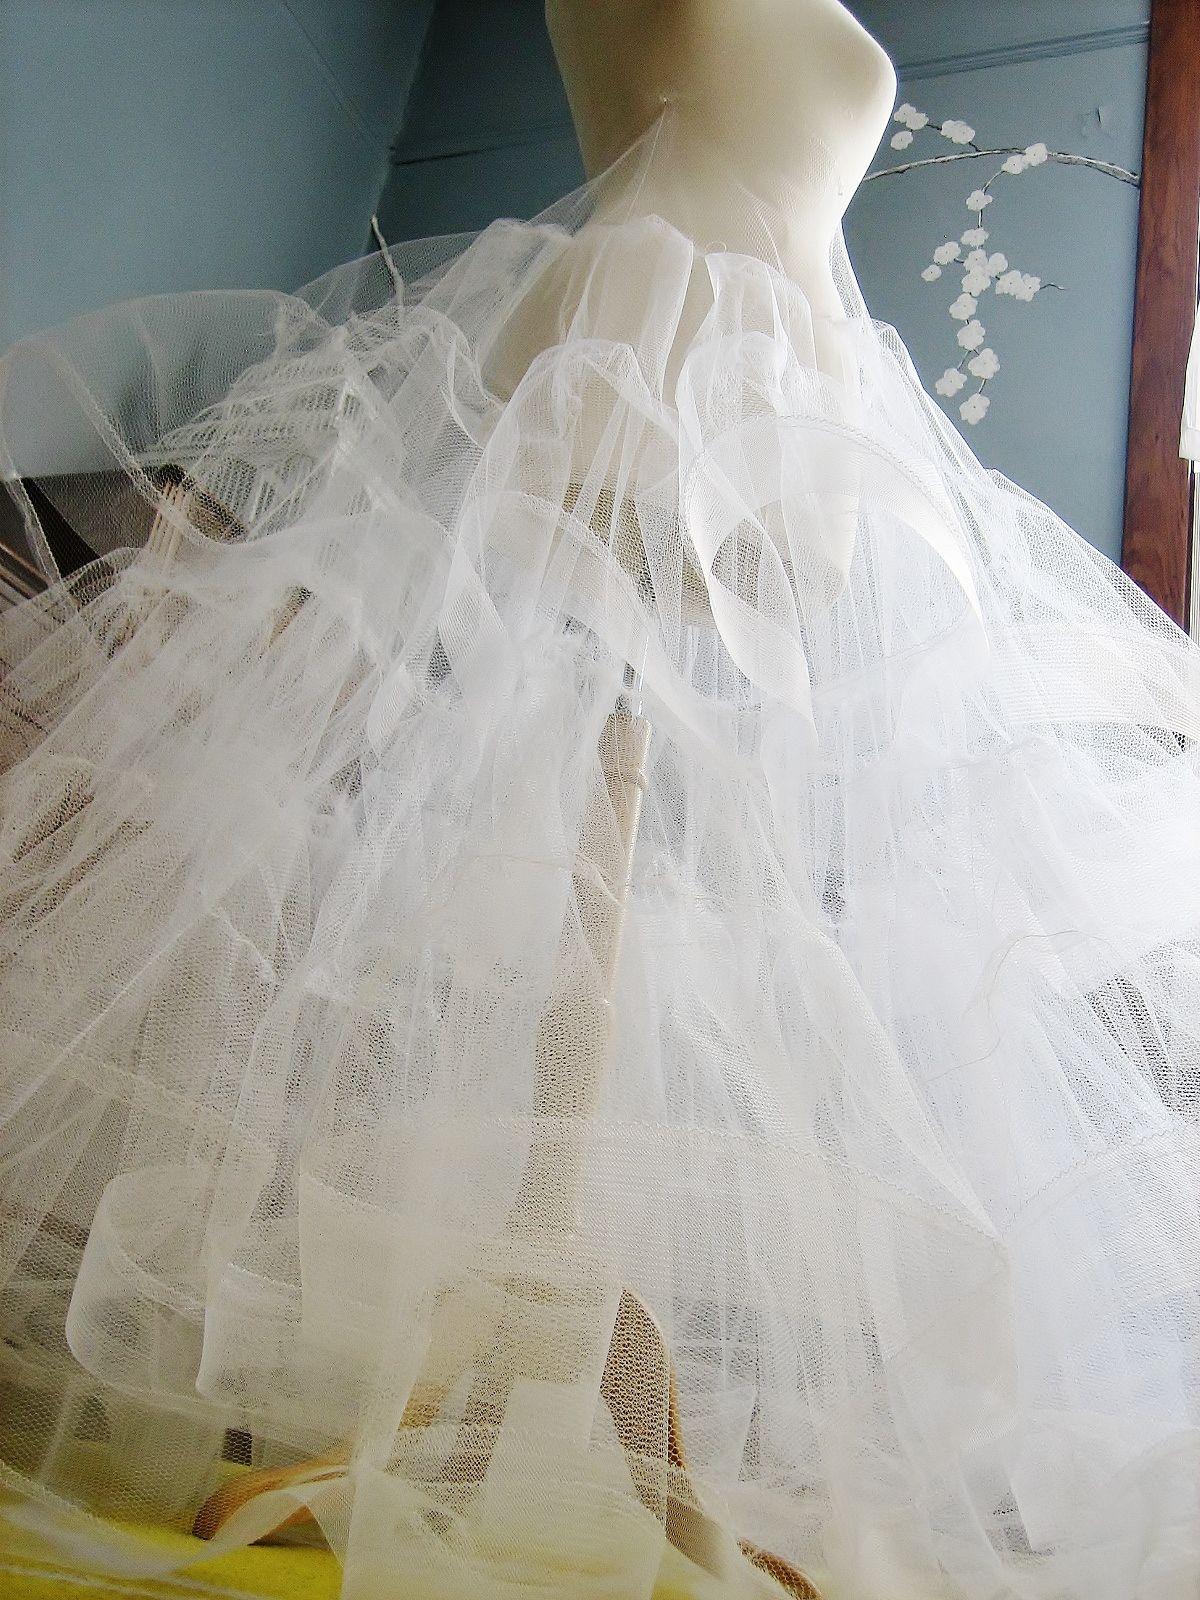 veronica sheaffer petticoat crinoline ballgown tulle horsehair braid ...